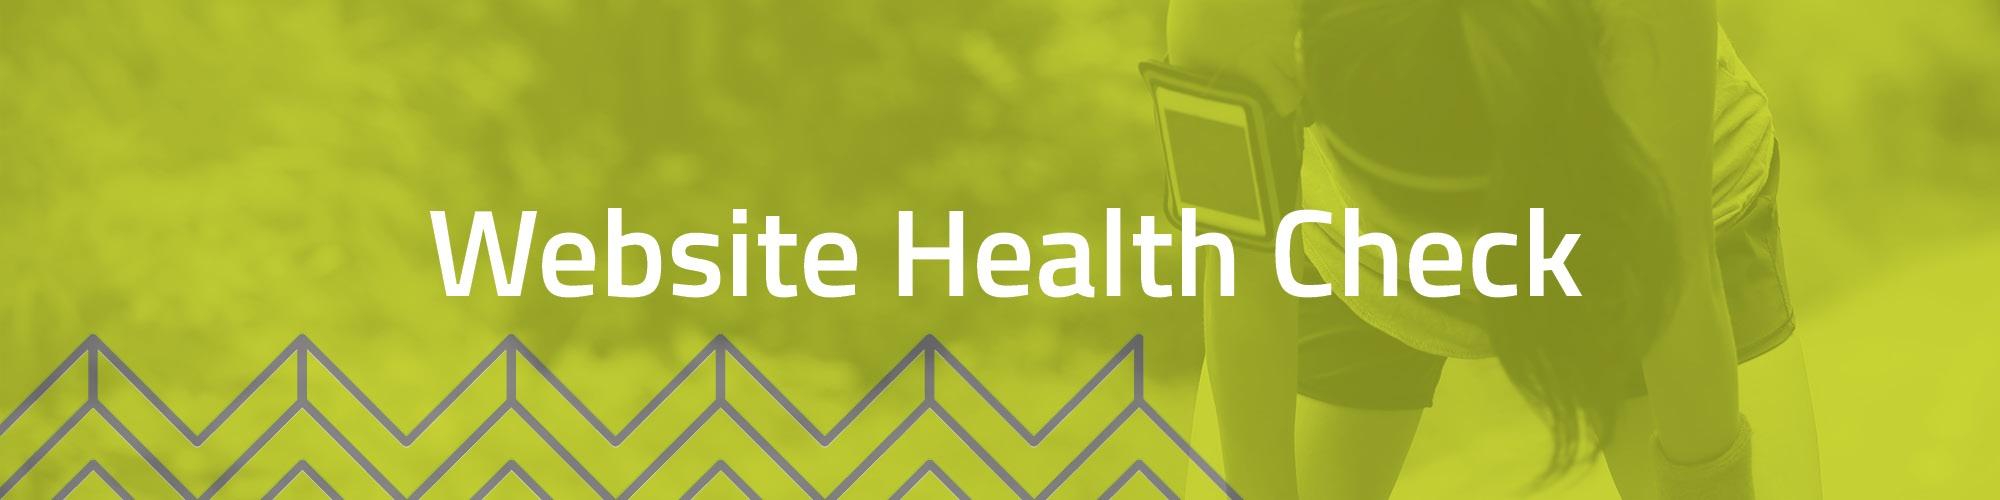 Imagewerks Marketing Website Health Check